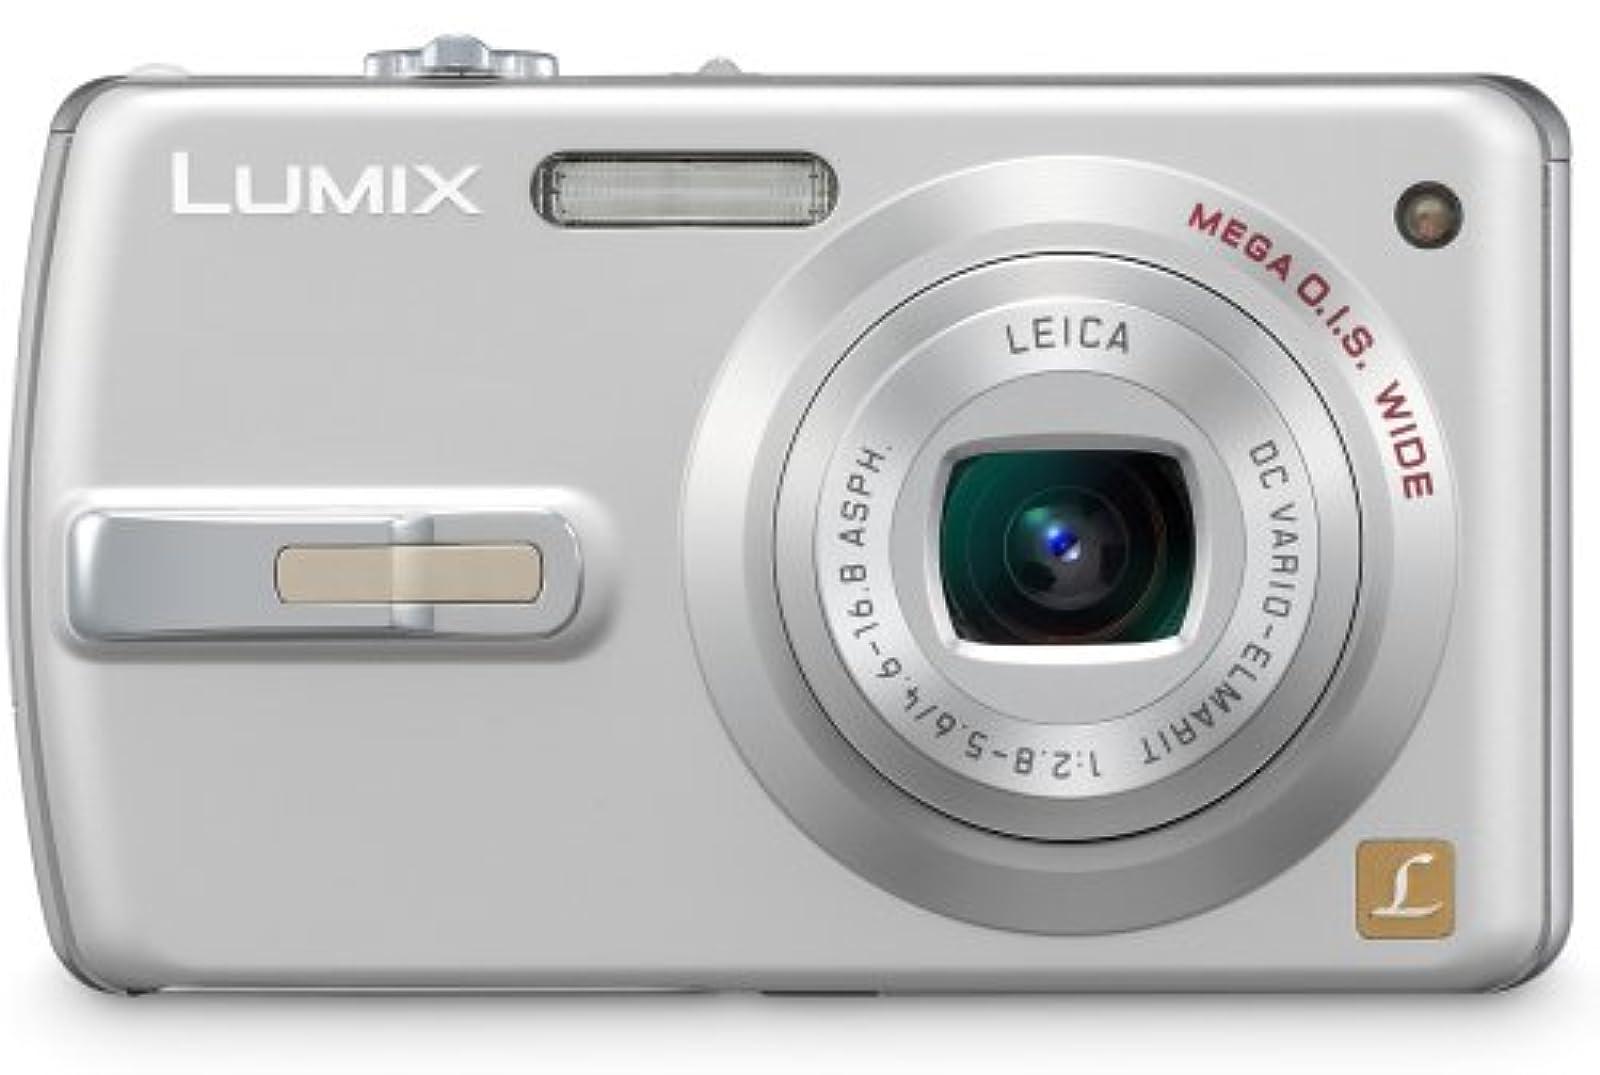 Panasonic DMC-FX50S 7.2MP Digital Camera With 3.6X Optical Image Stabilized Zoom